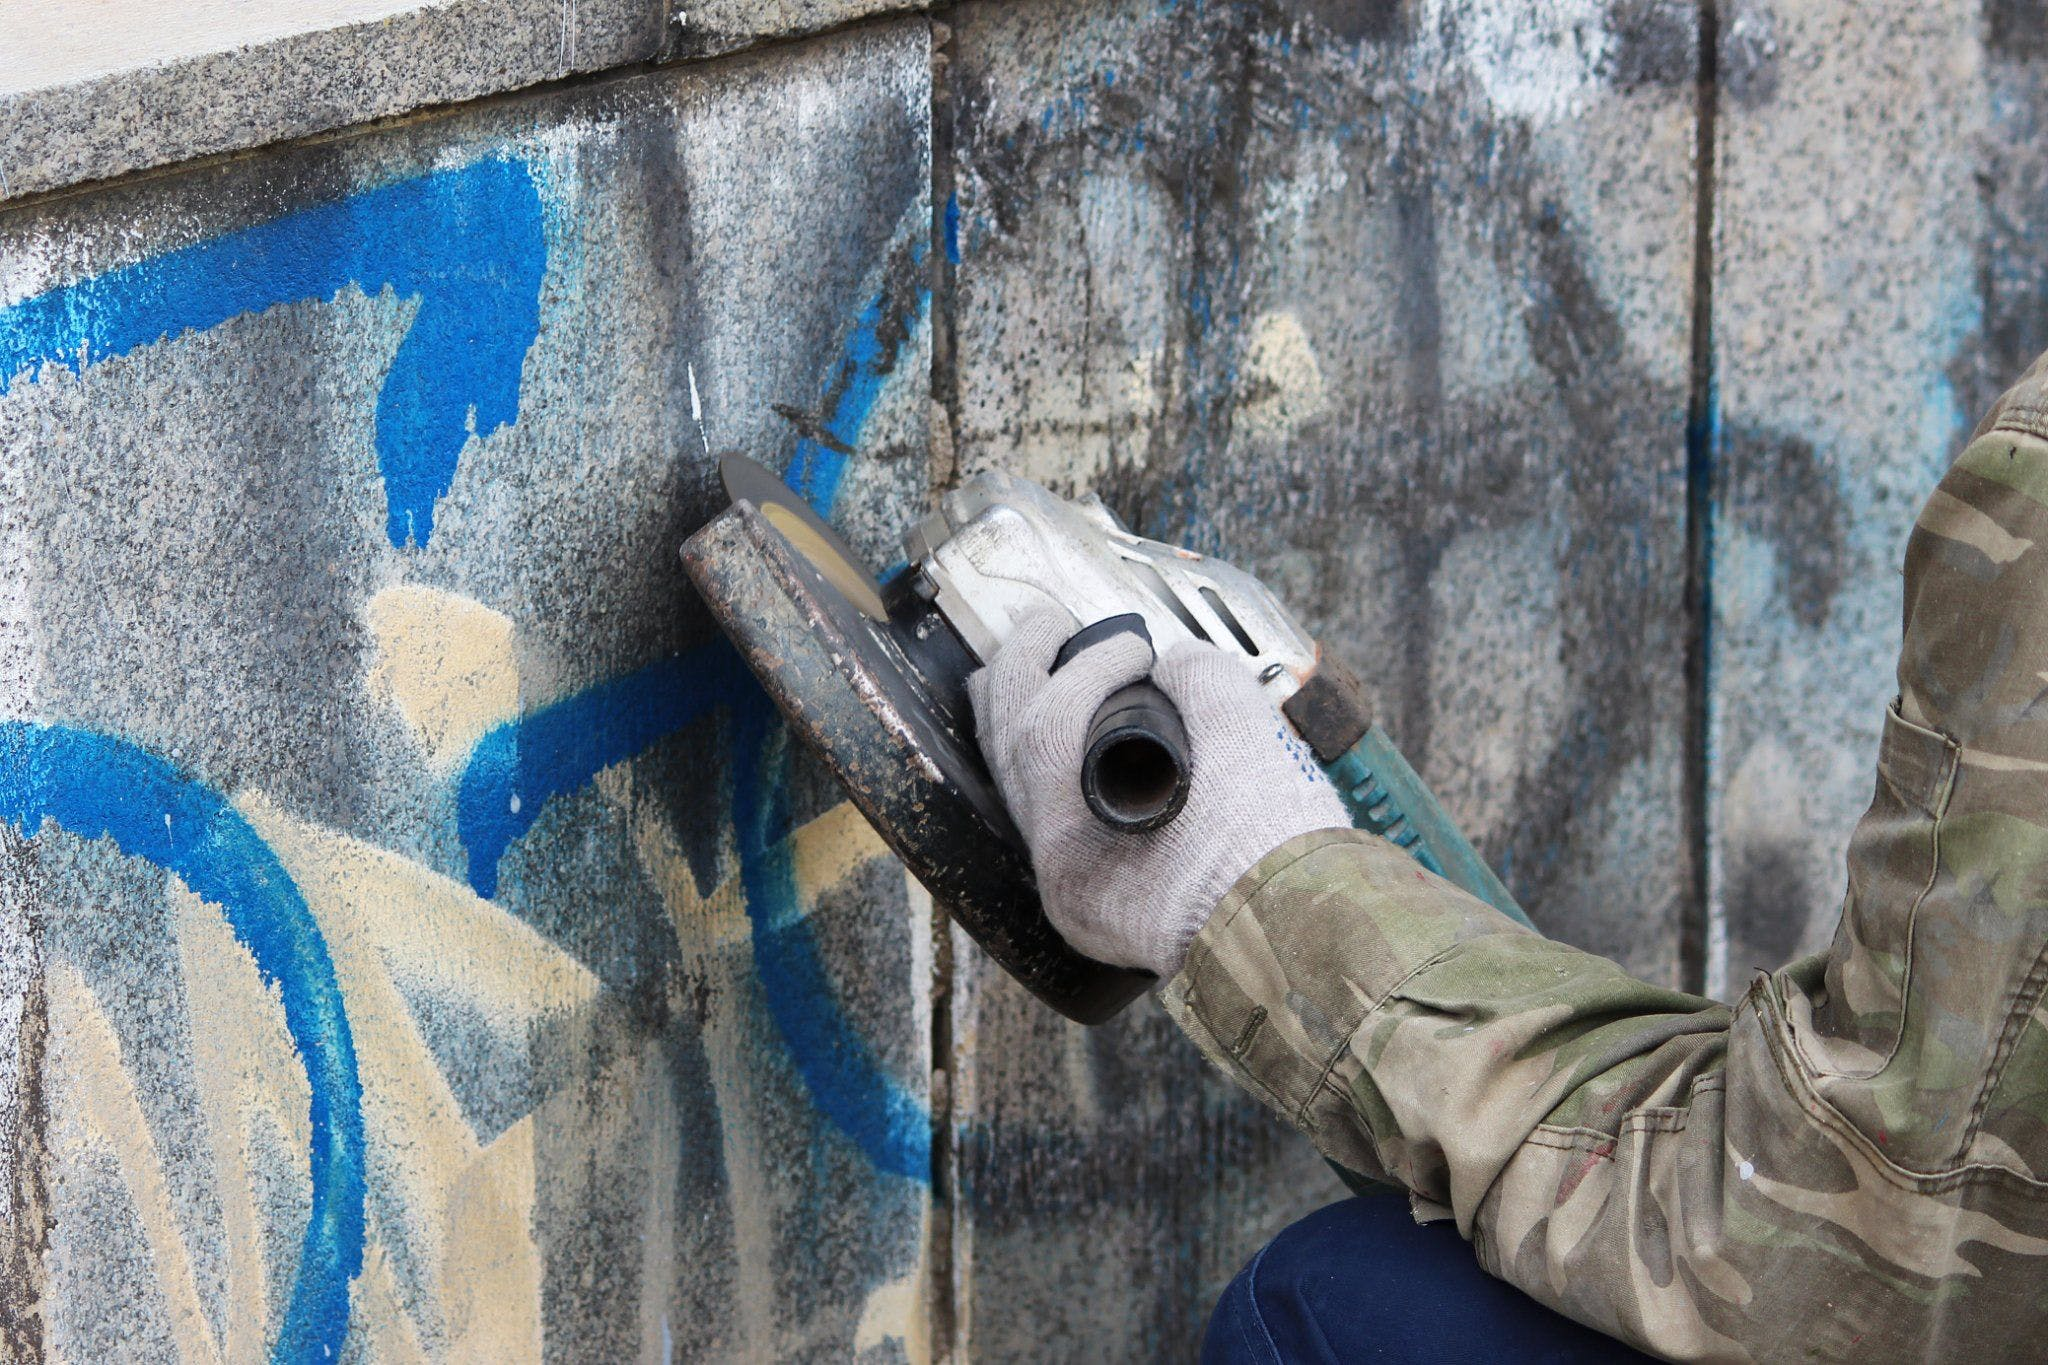 graffiti-laten-reinigen